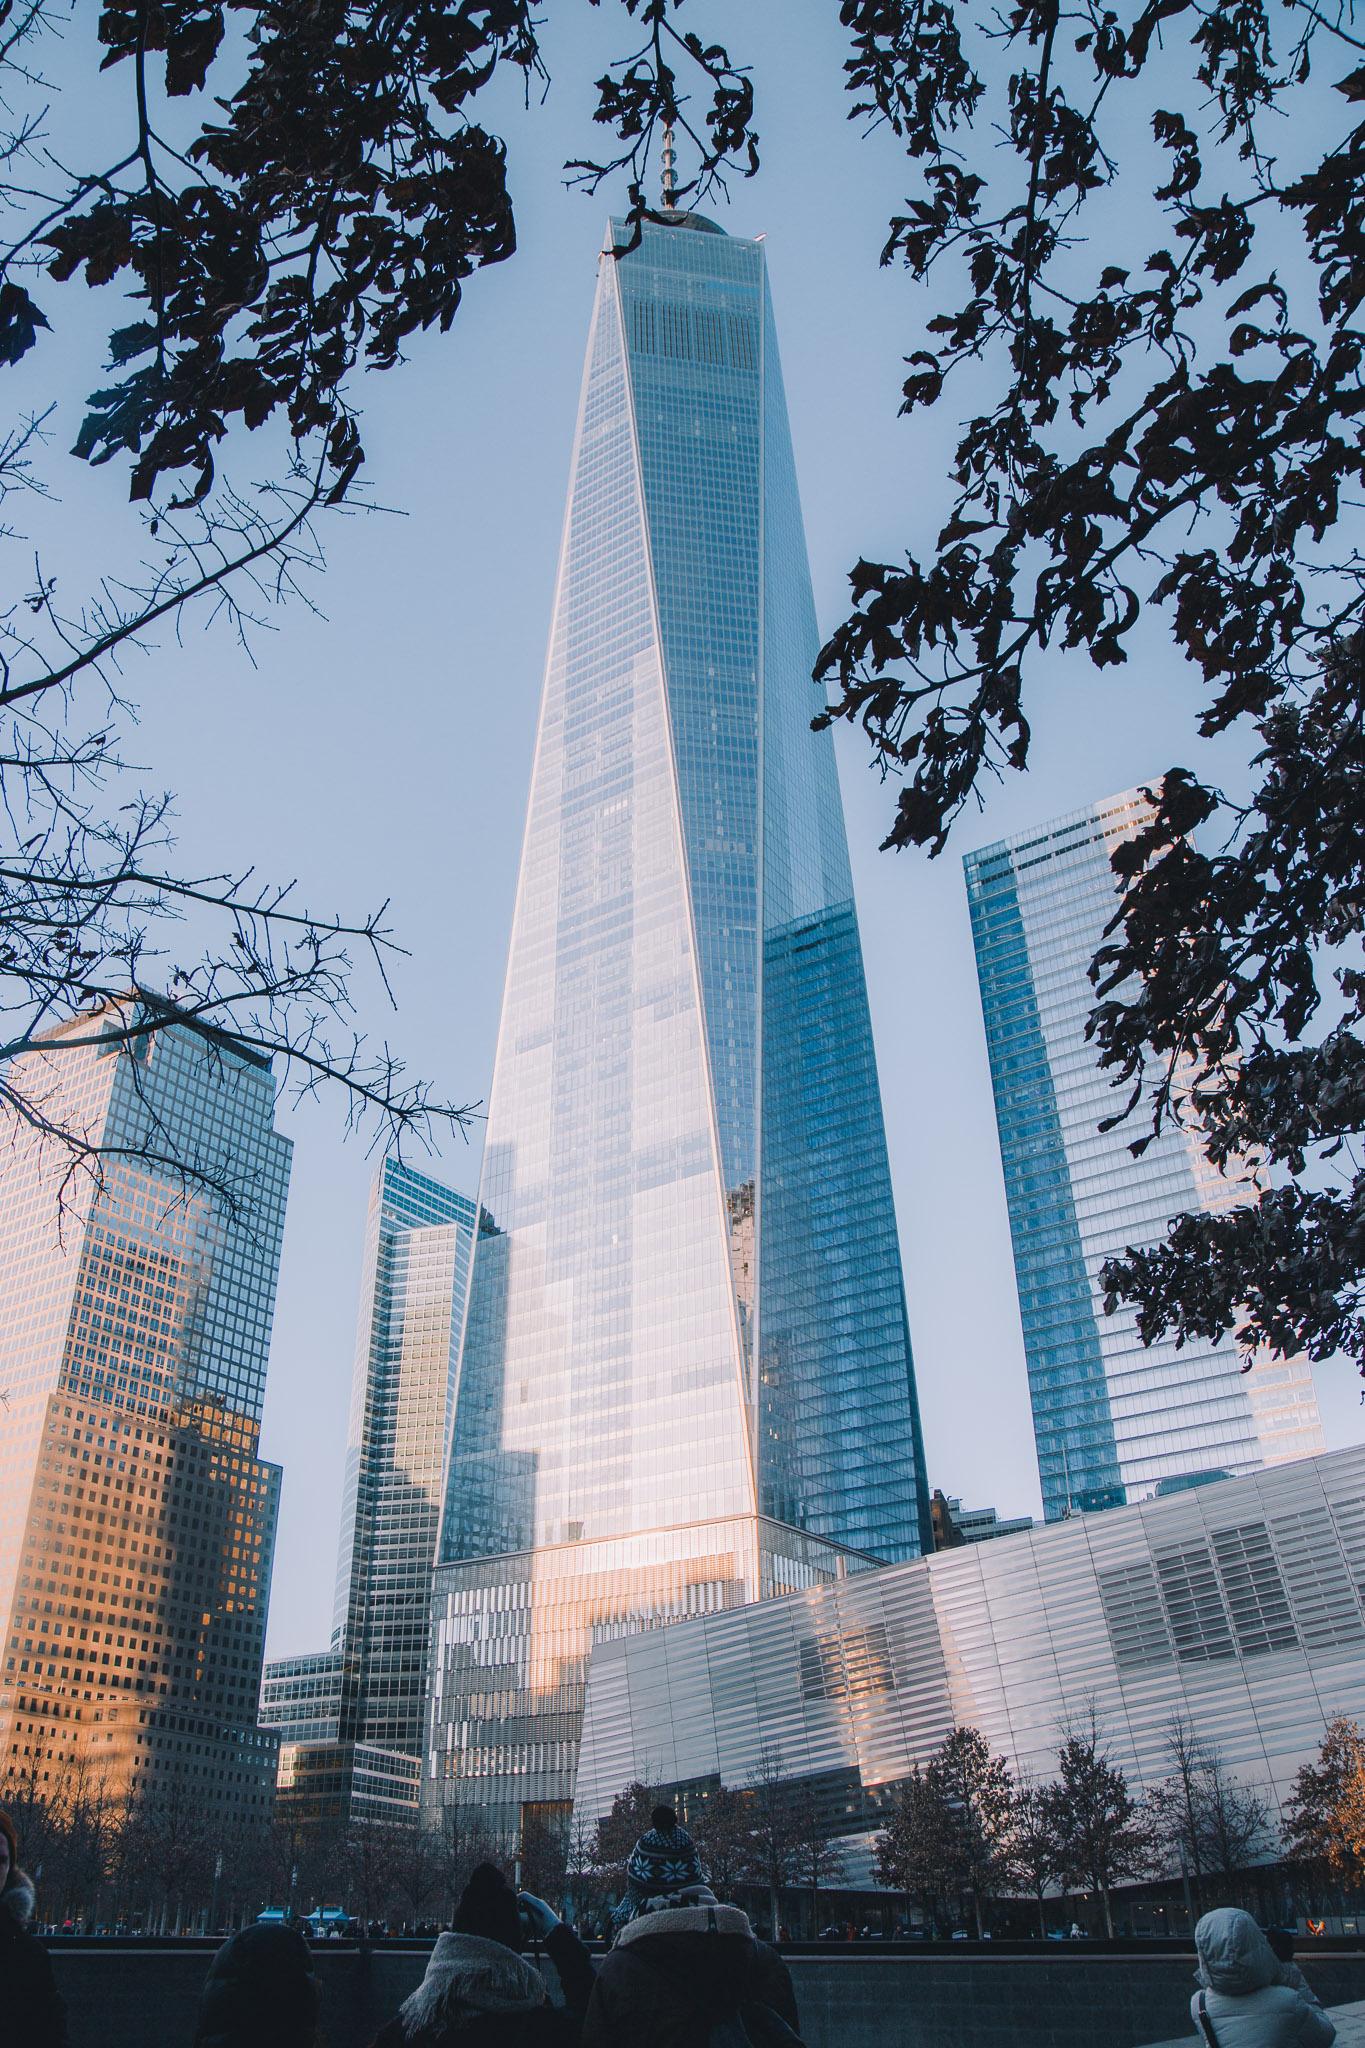 america-new-york-city-one-world-trade-center.jpg